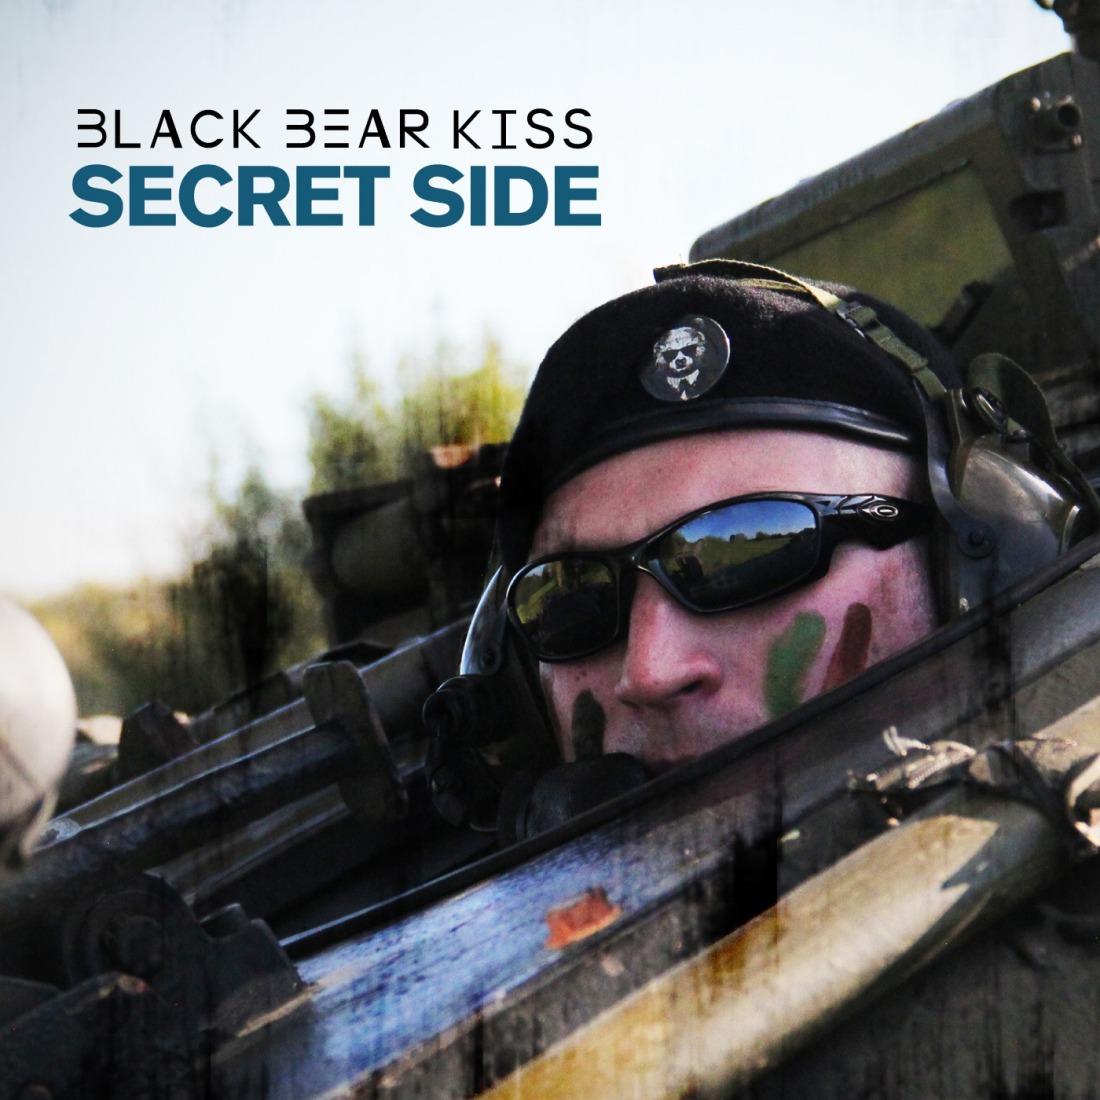 Secret Side